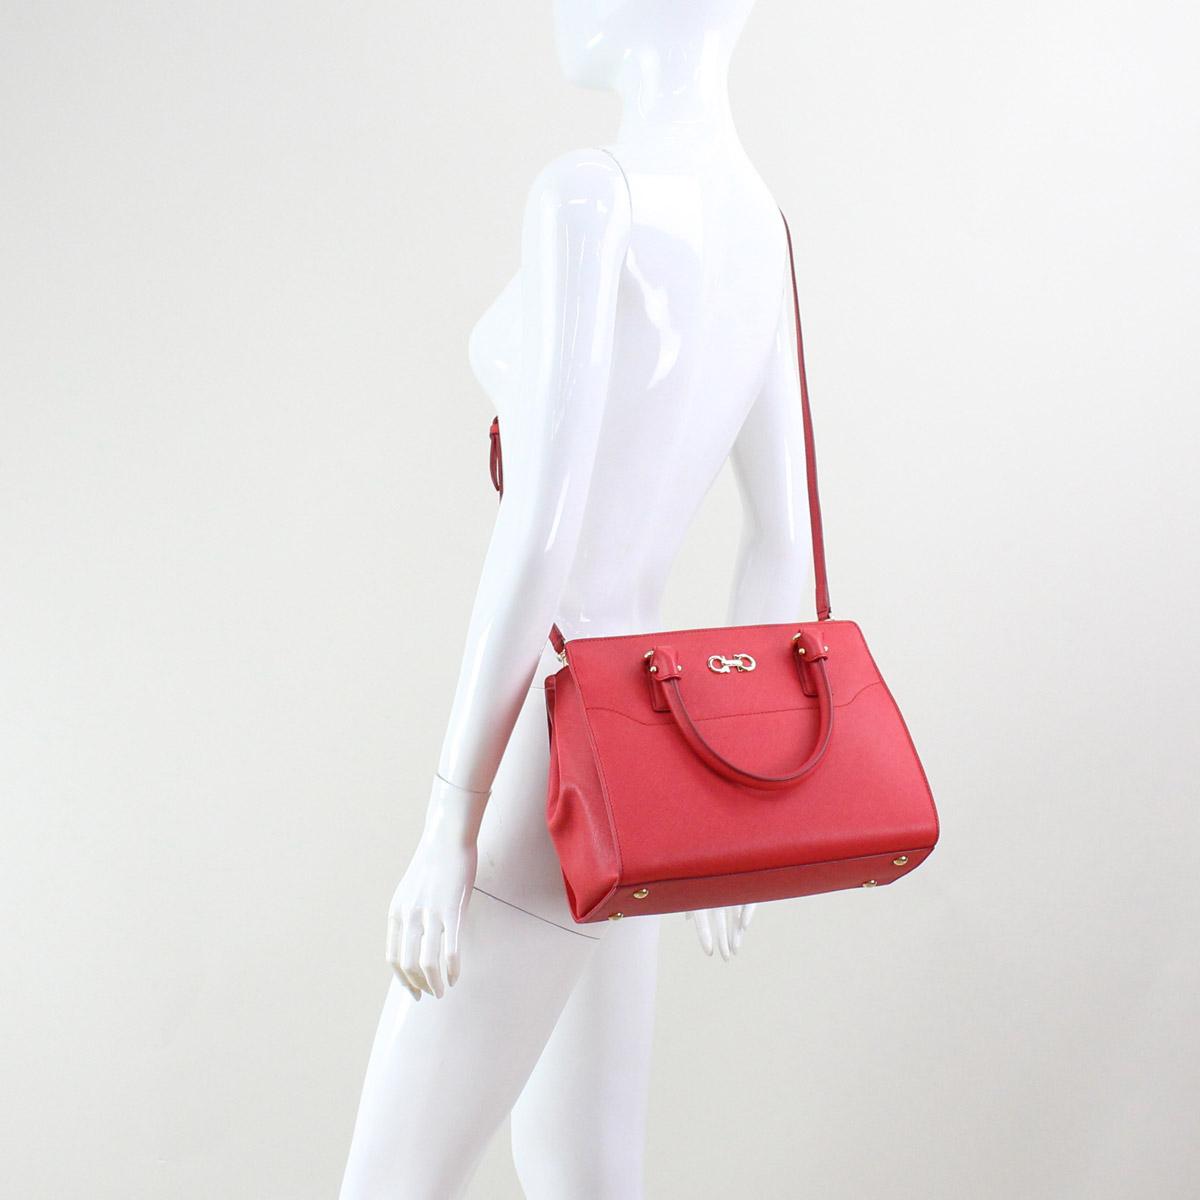 a4e007a50f5a Bighit The total brand wholesale  Ferragamo (FERRAGAMO) BEKY handbag ...